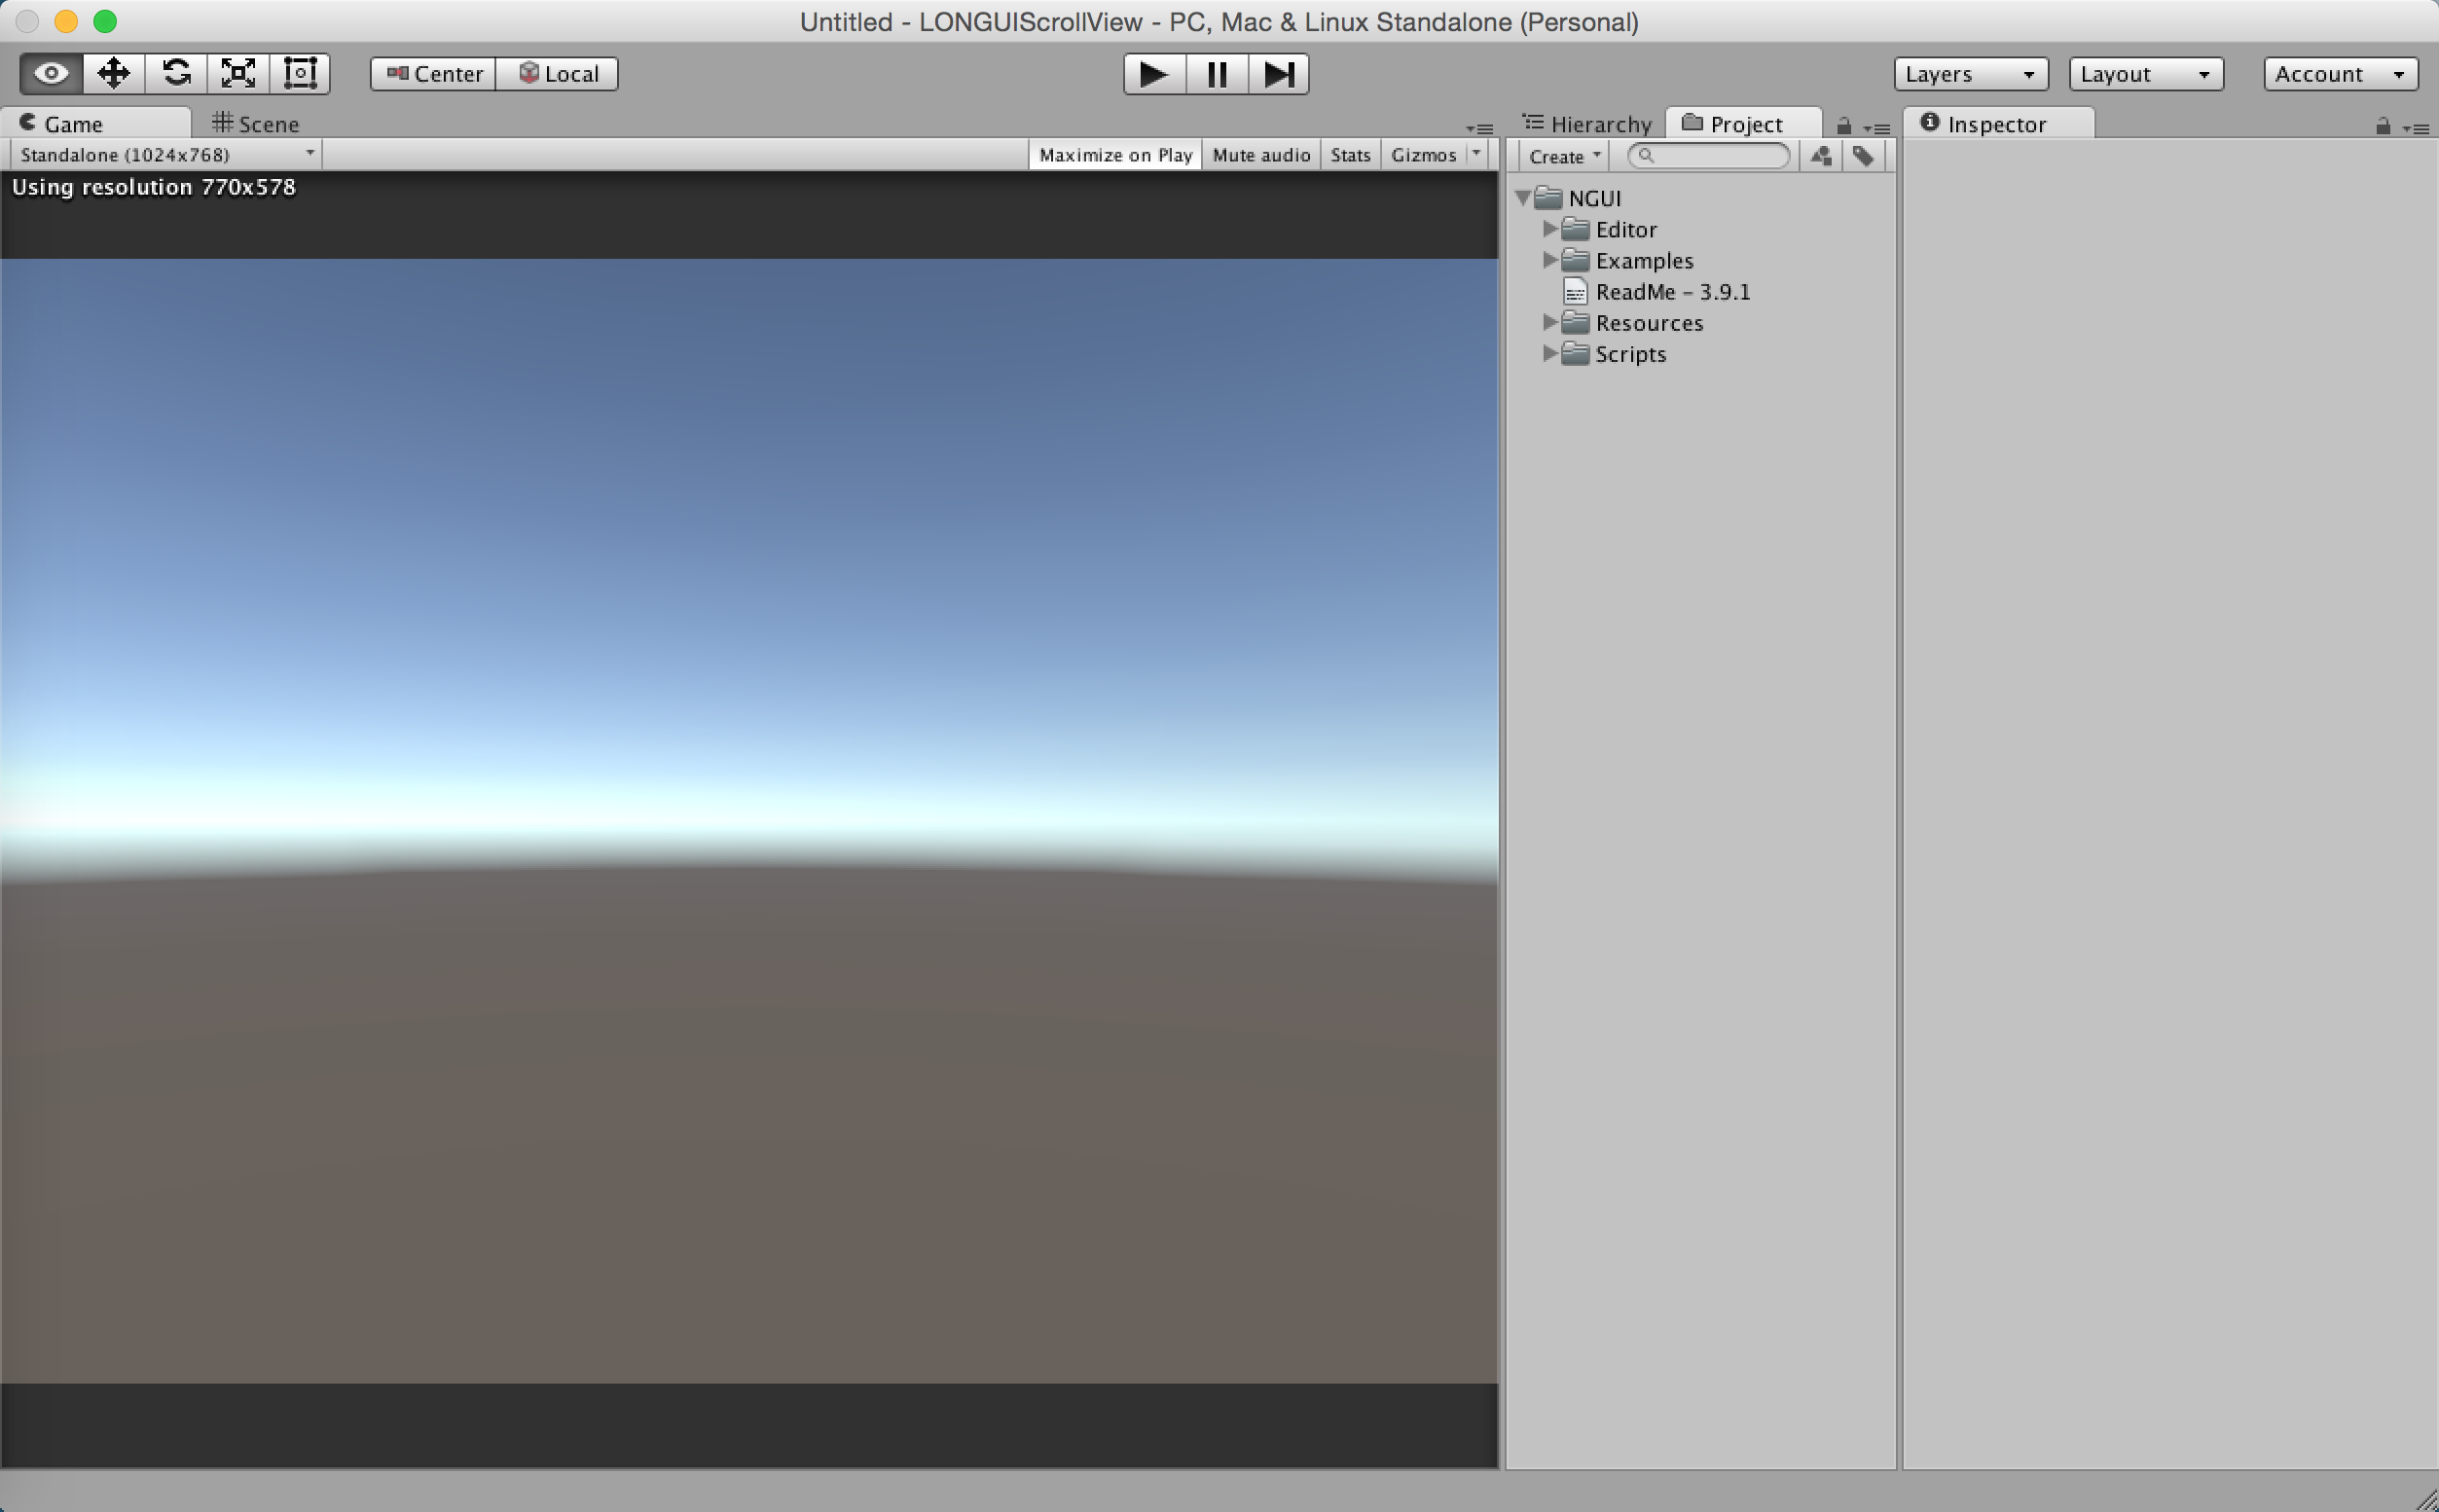 Unity]Unity开发NGUI代码实现ScrollView(滚动视图) - 浩浩老师的